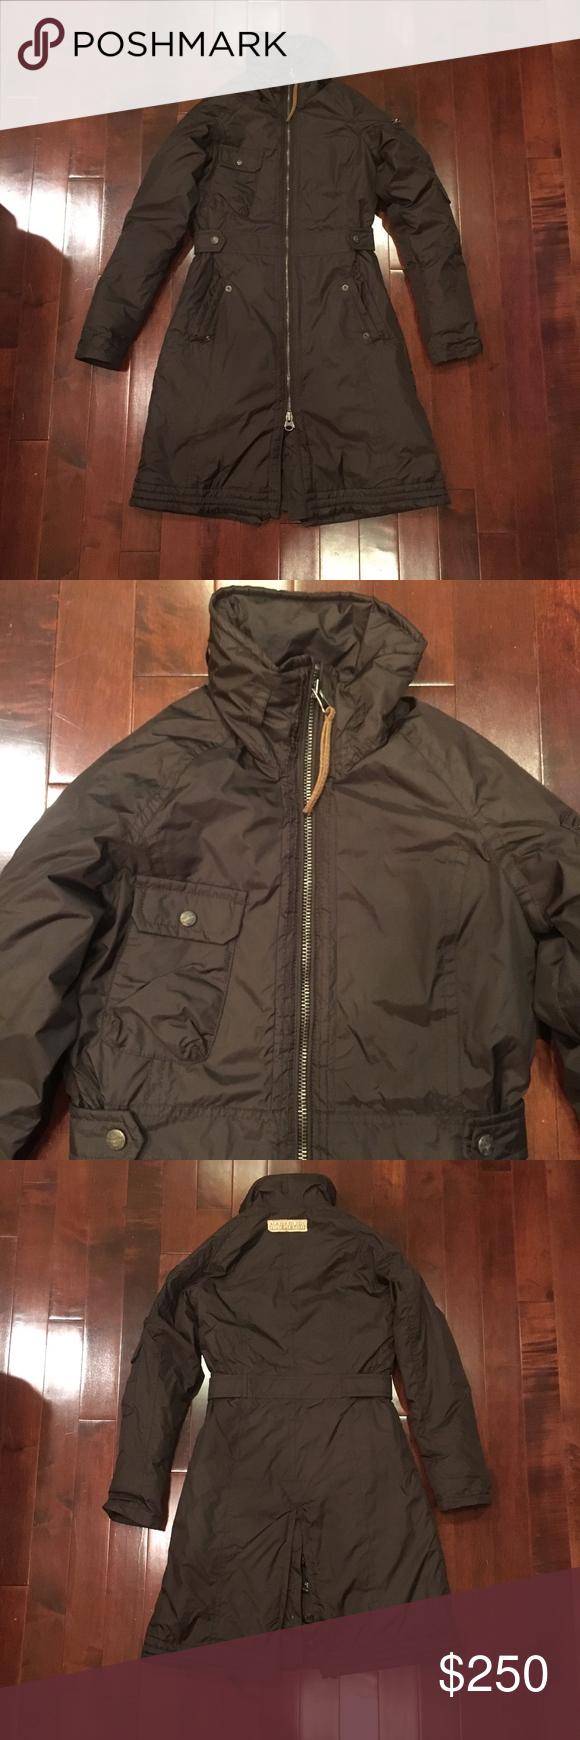 Women S Napapijri Brown Long Winter Puffer Jacket Jackets Winter Puffer Jackets Long Winter [ 1740 x 580 Pixel ]